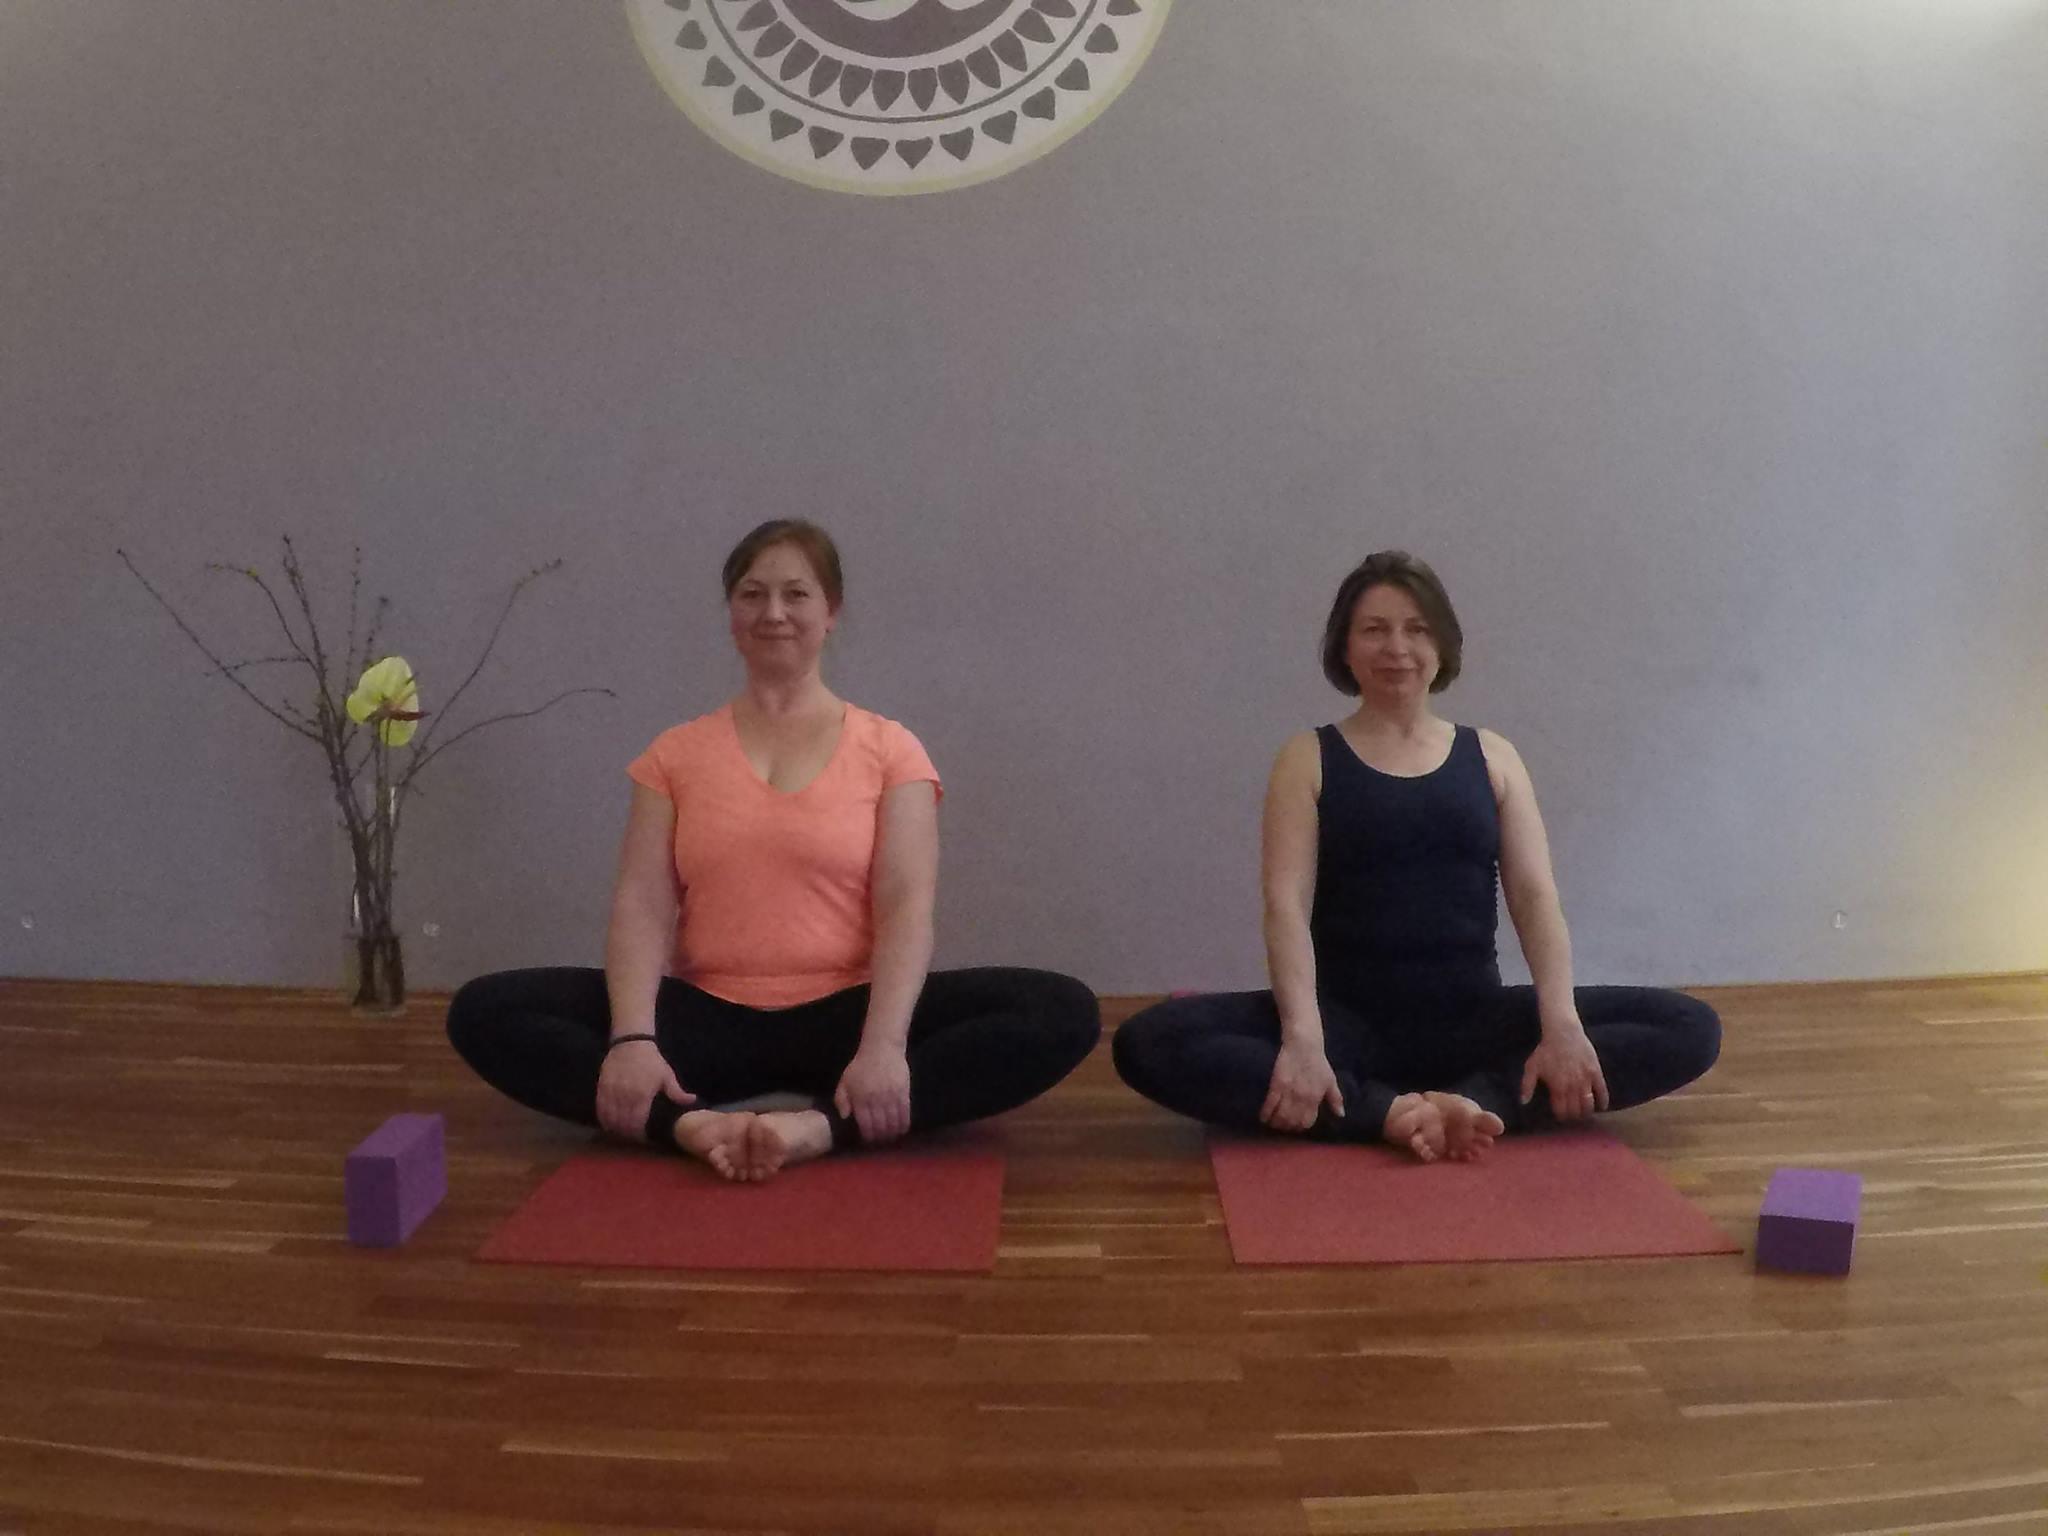 https://yogacircle-berlin.de/wp-content/uploads/2017/04/17814460_1349488345118679_6943901122831822522_o.jpg